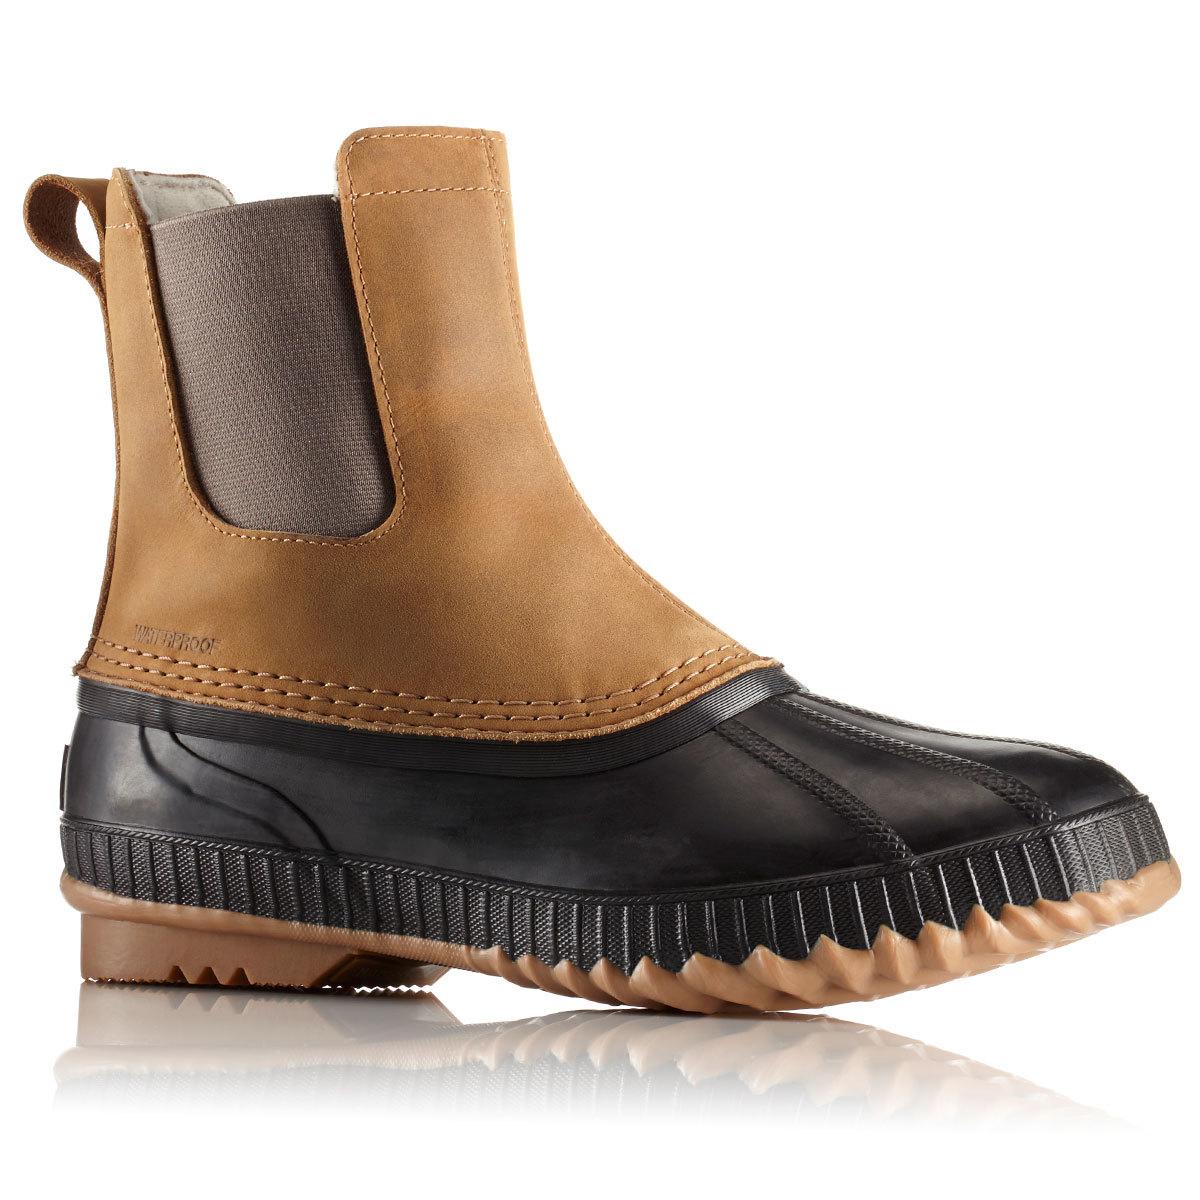 Sorel Men's 8 In. Cheyanne Ii Chelsea Waterproof Duck Boots, Elk - Brown, 14